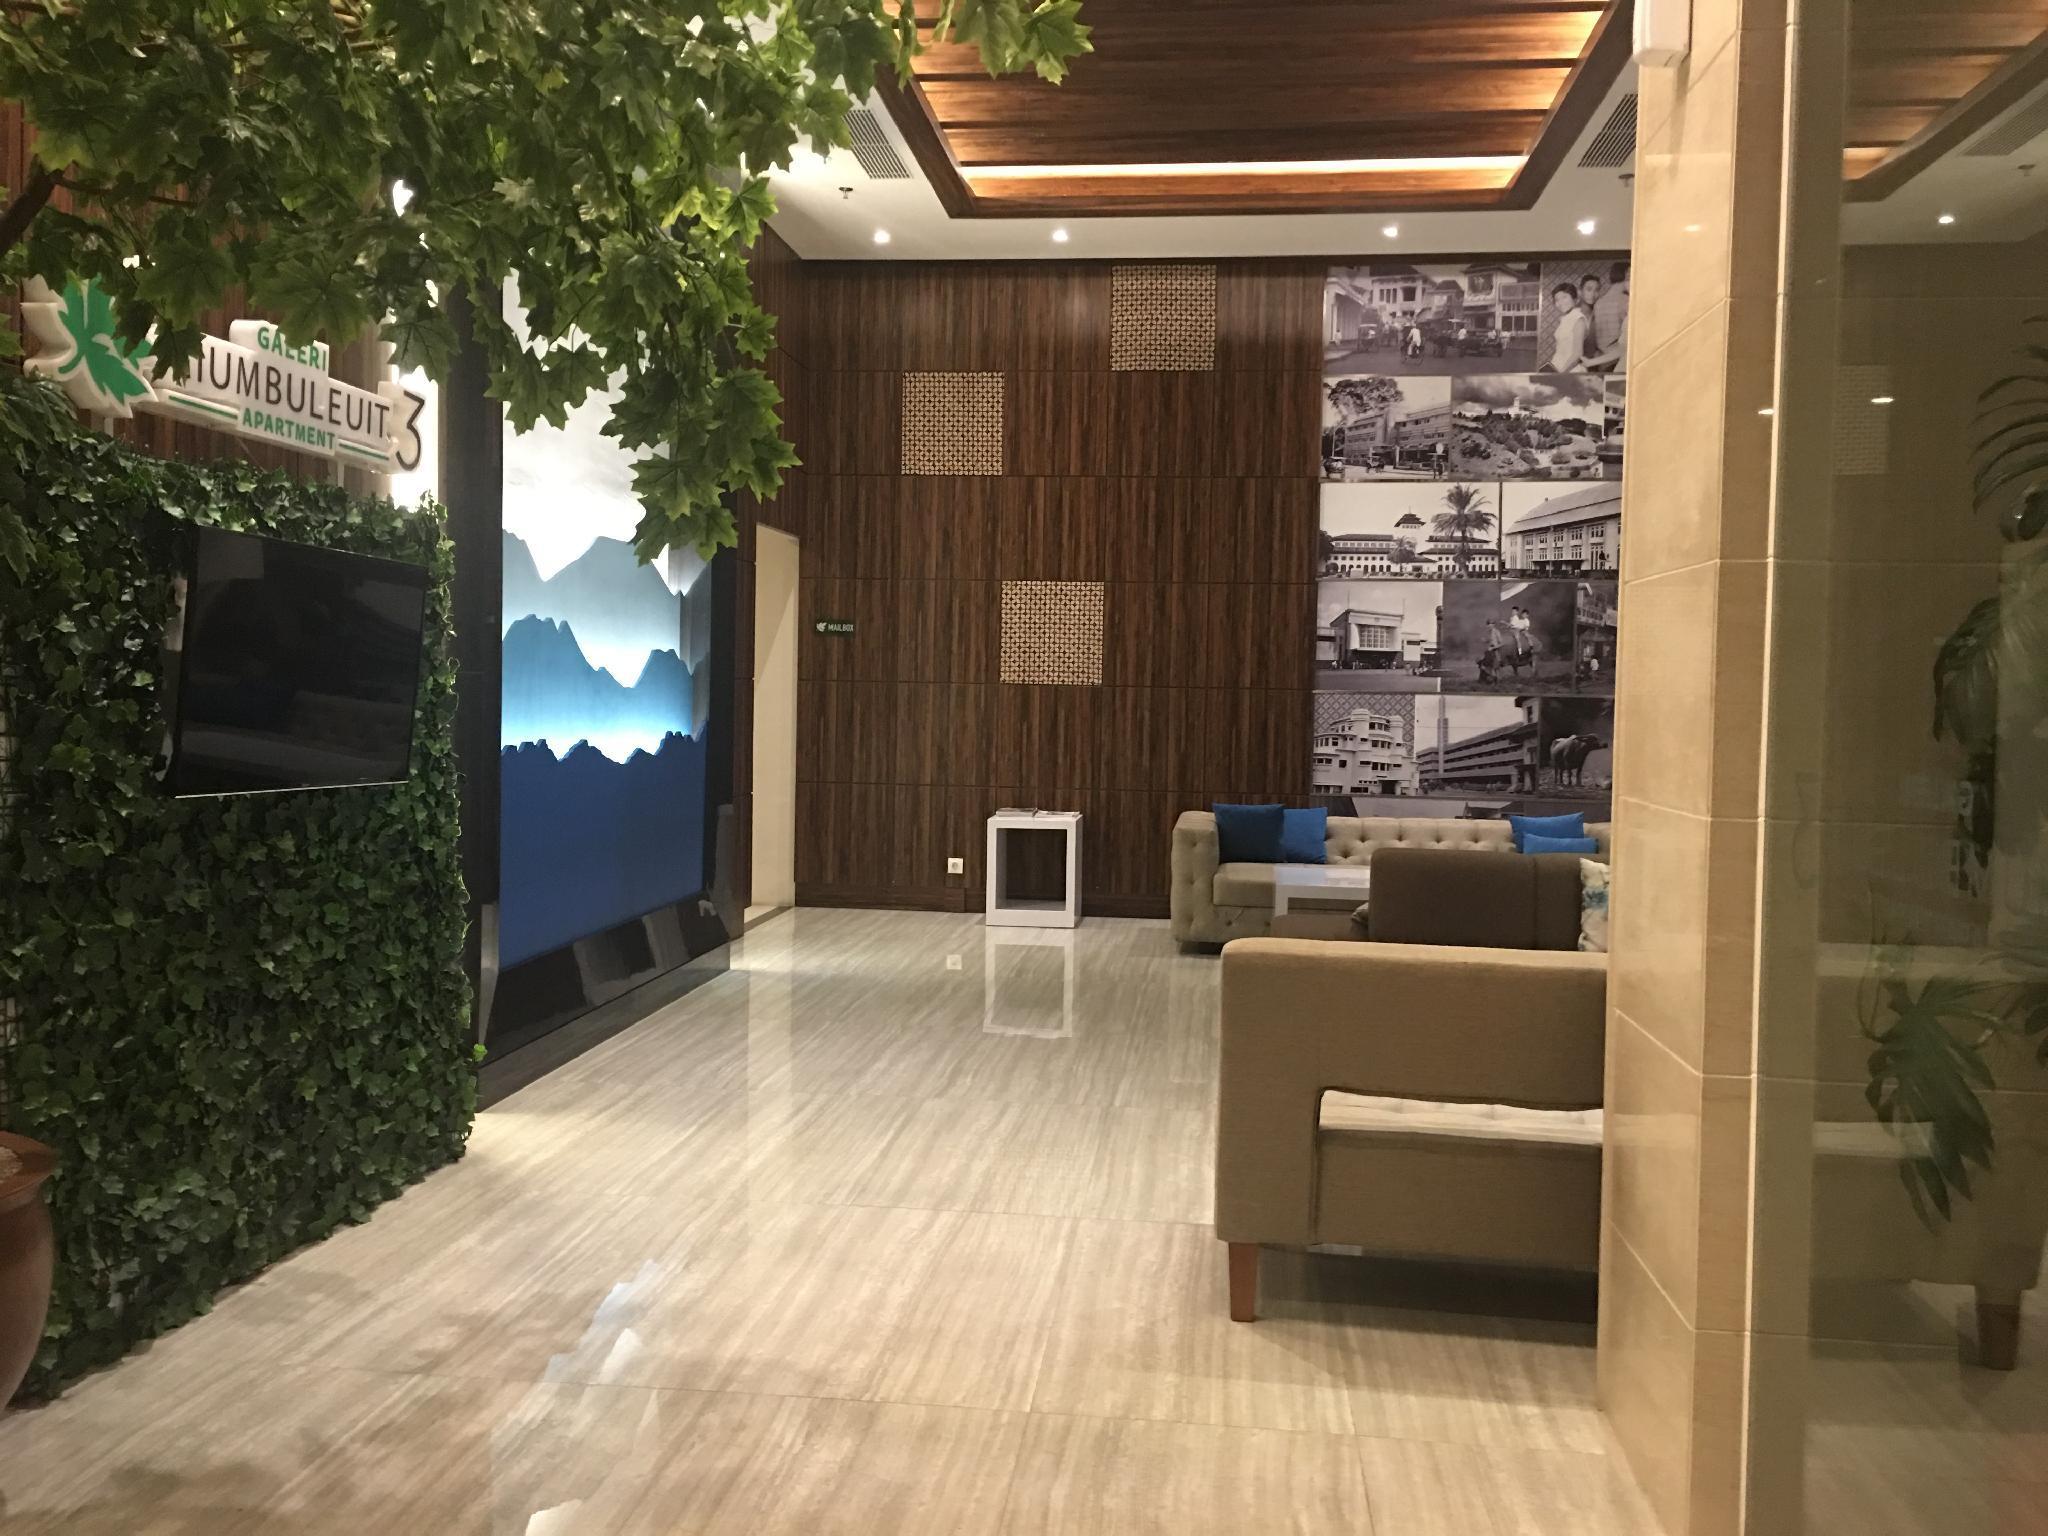 Price New! Cozy room at Galeri Ciumbuluit for 3 adult